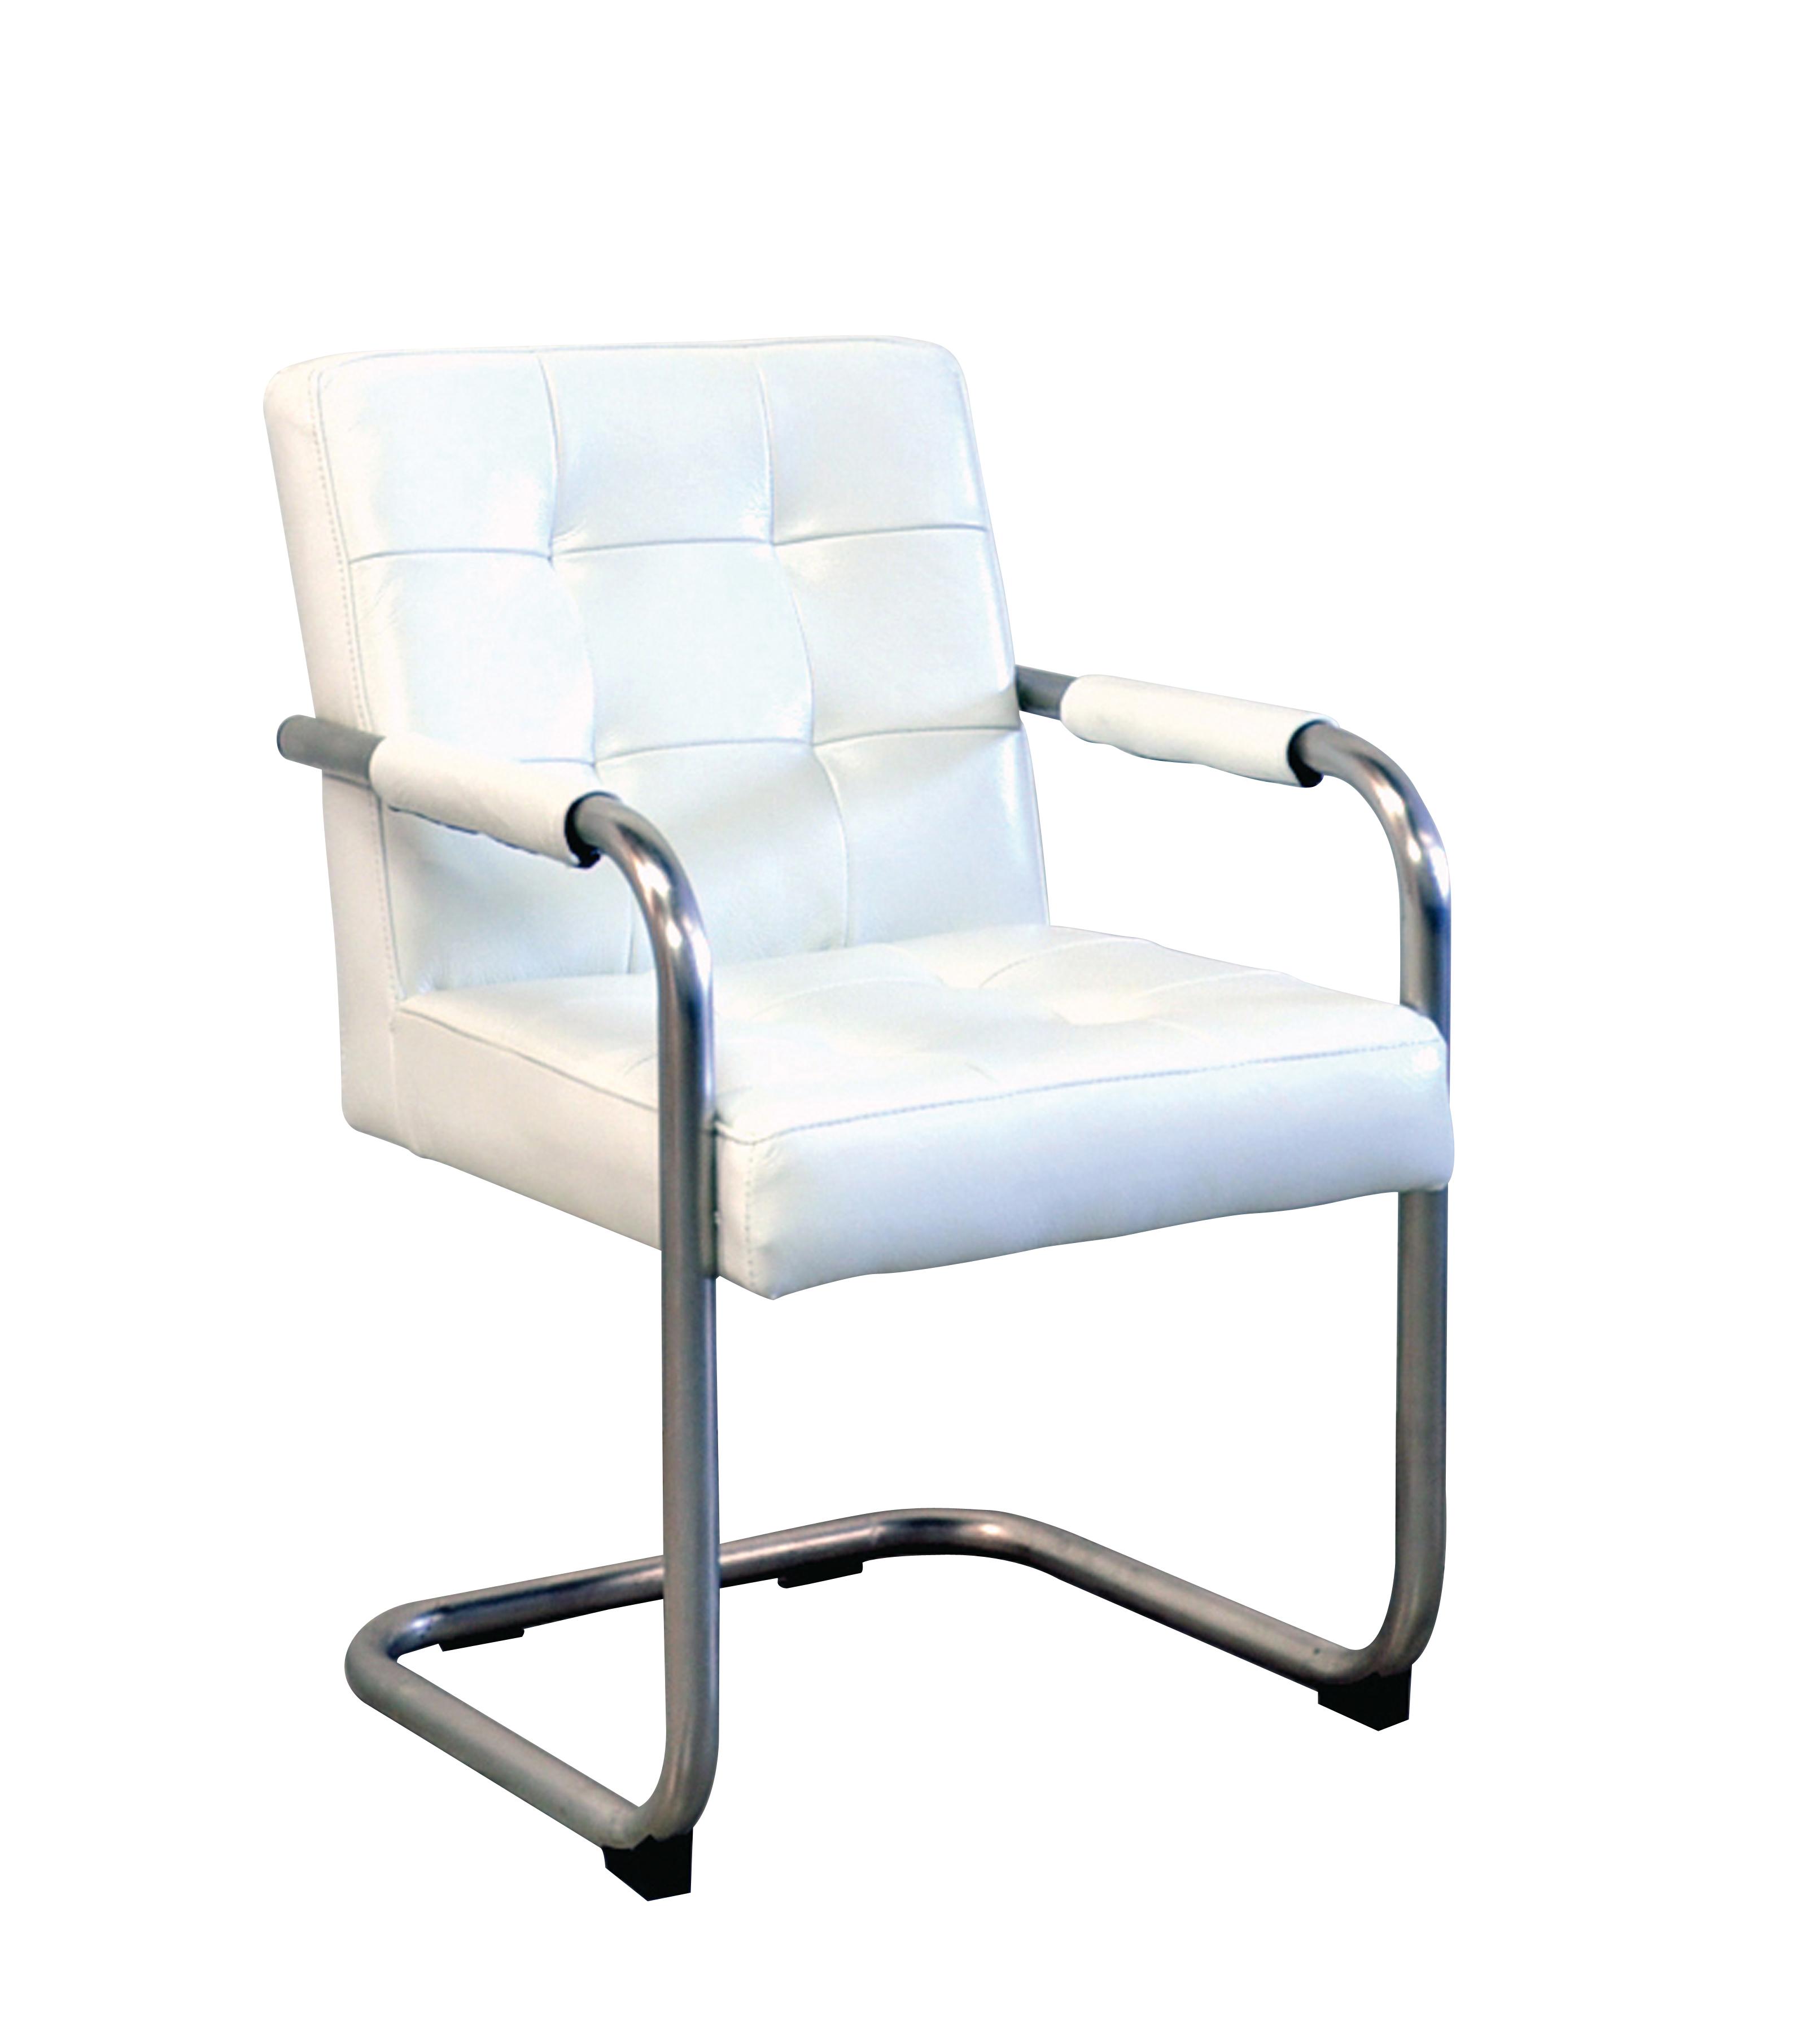 witte klassieke eetkamerstoelen vintage stoel kopen